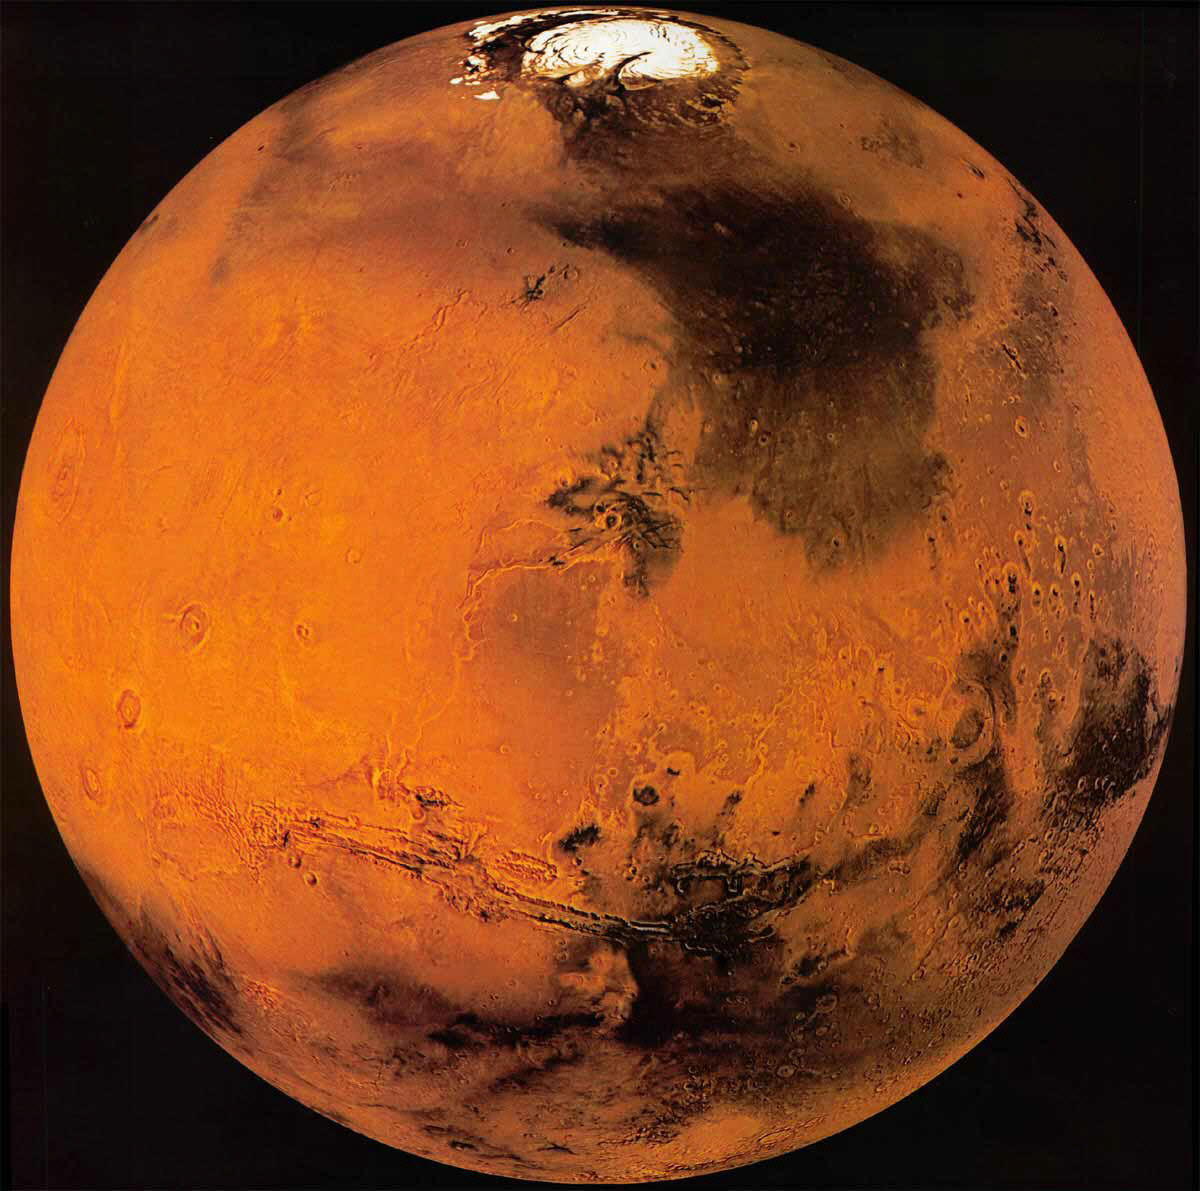 Bilder Mars